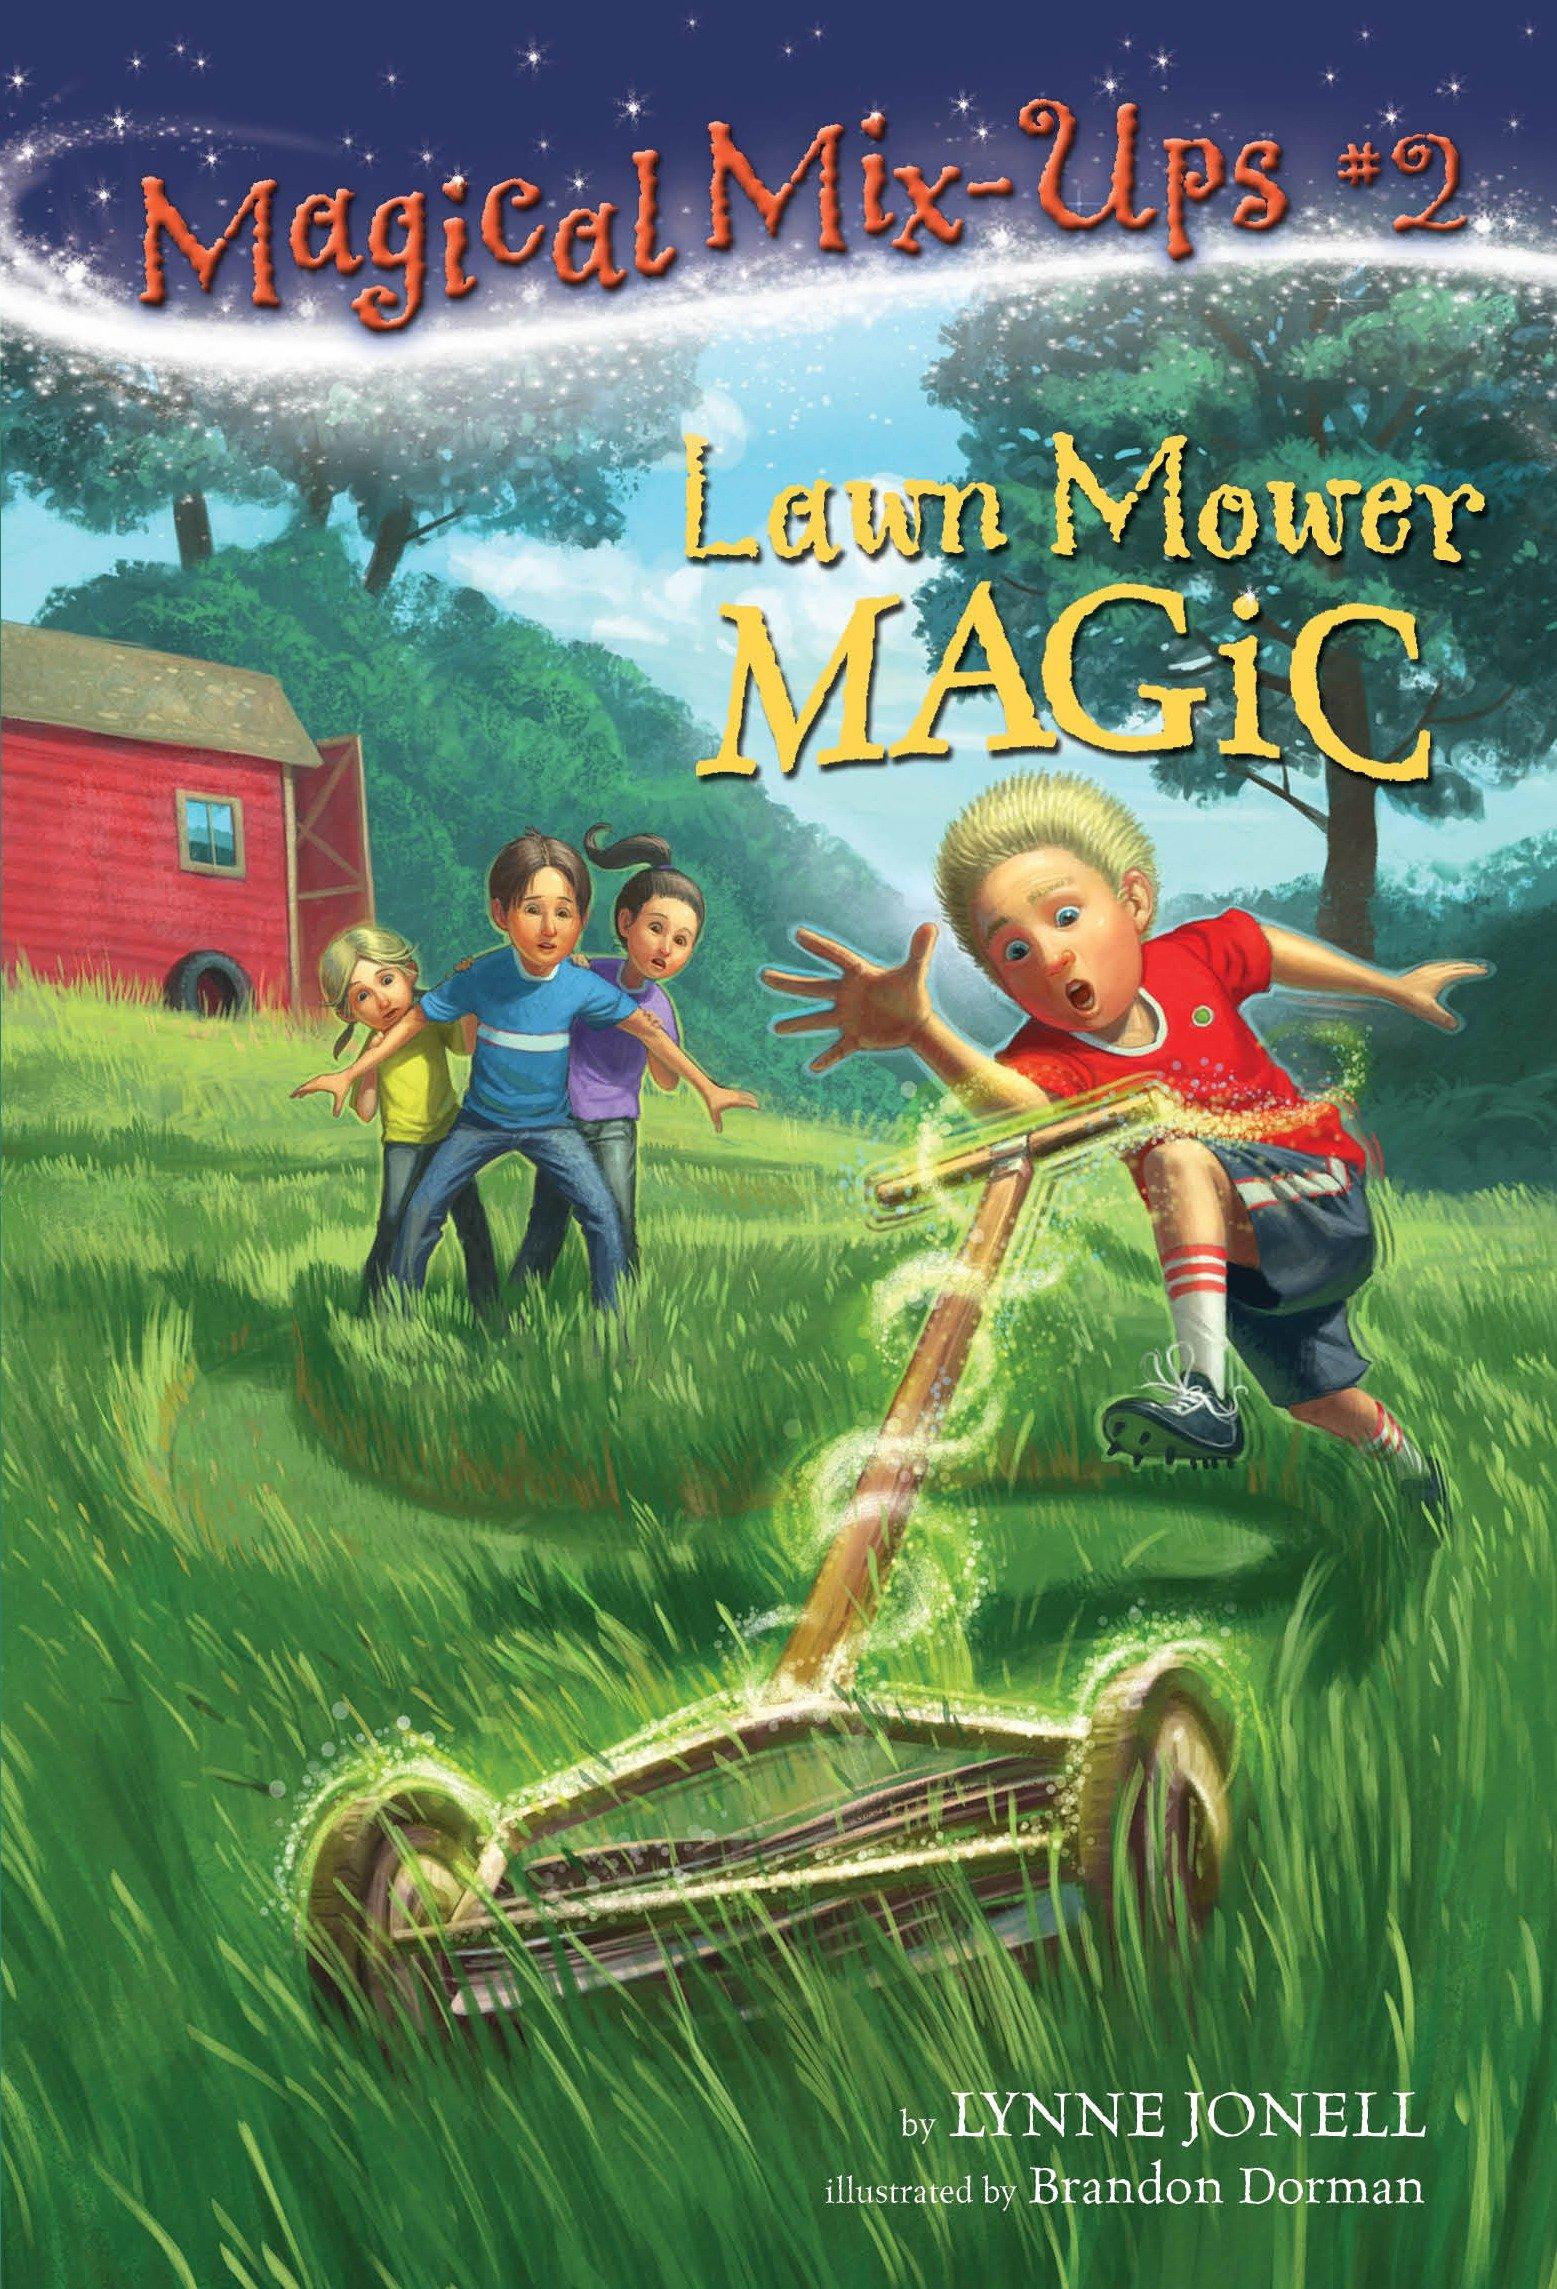 Lawn mower magic cover image